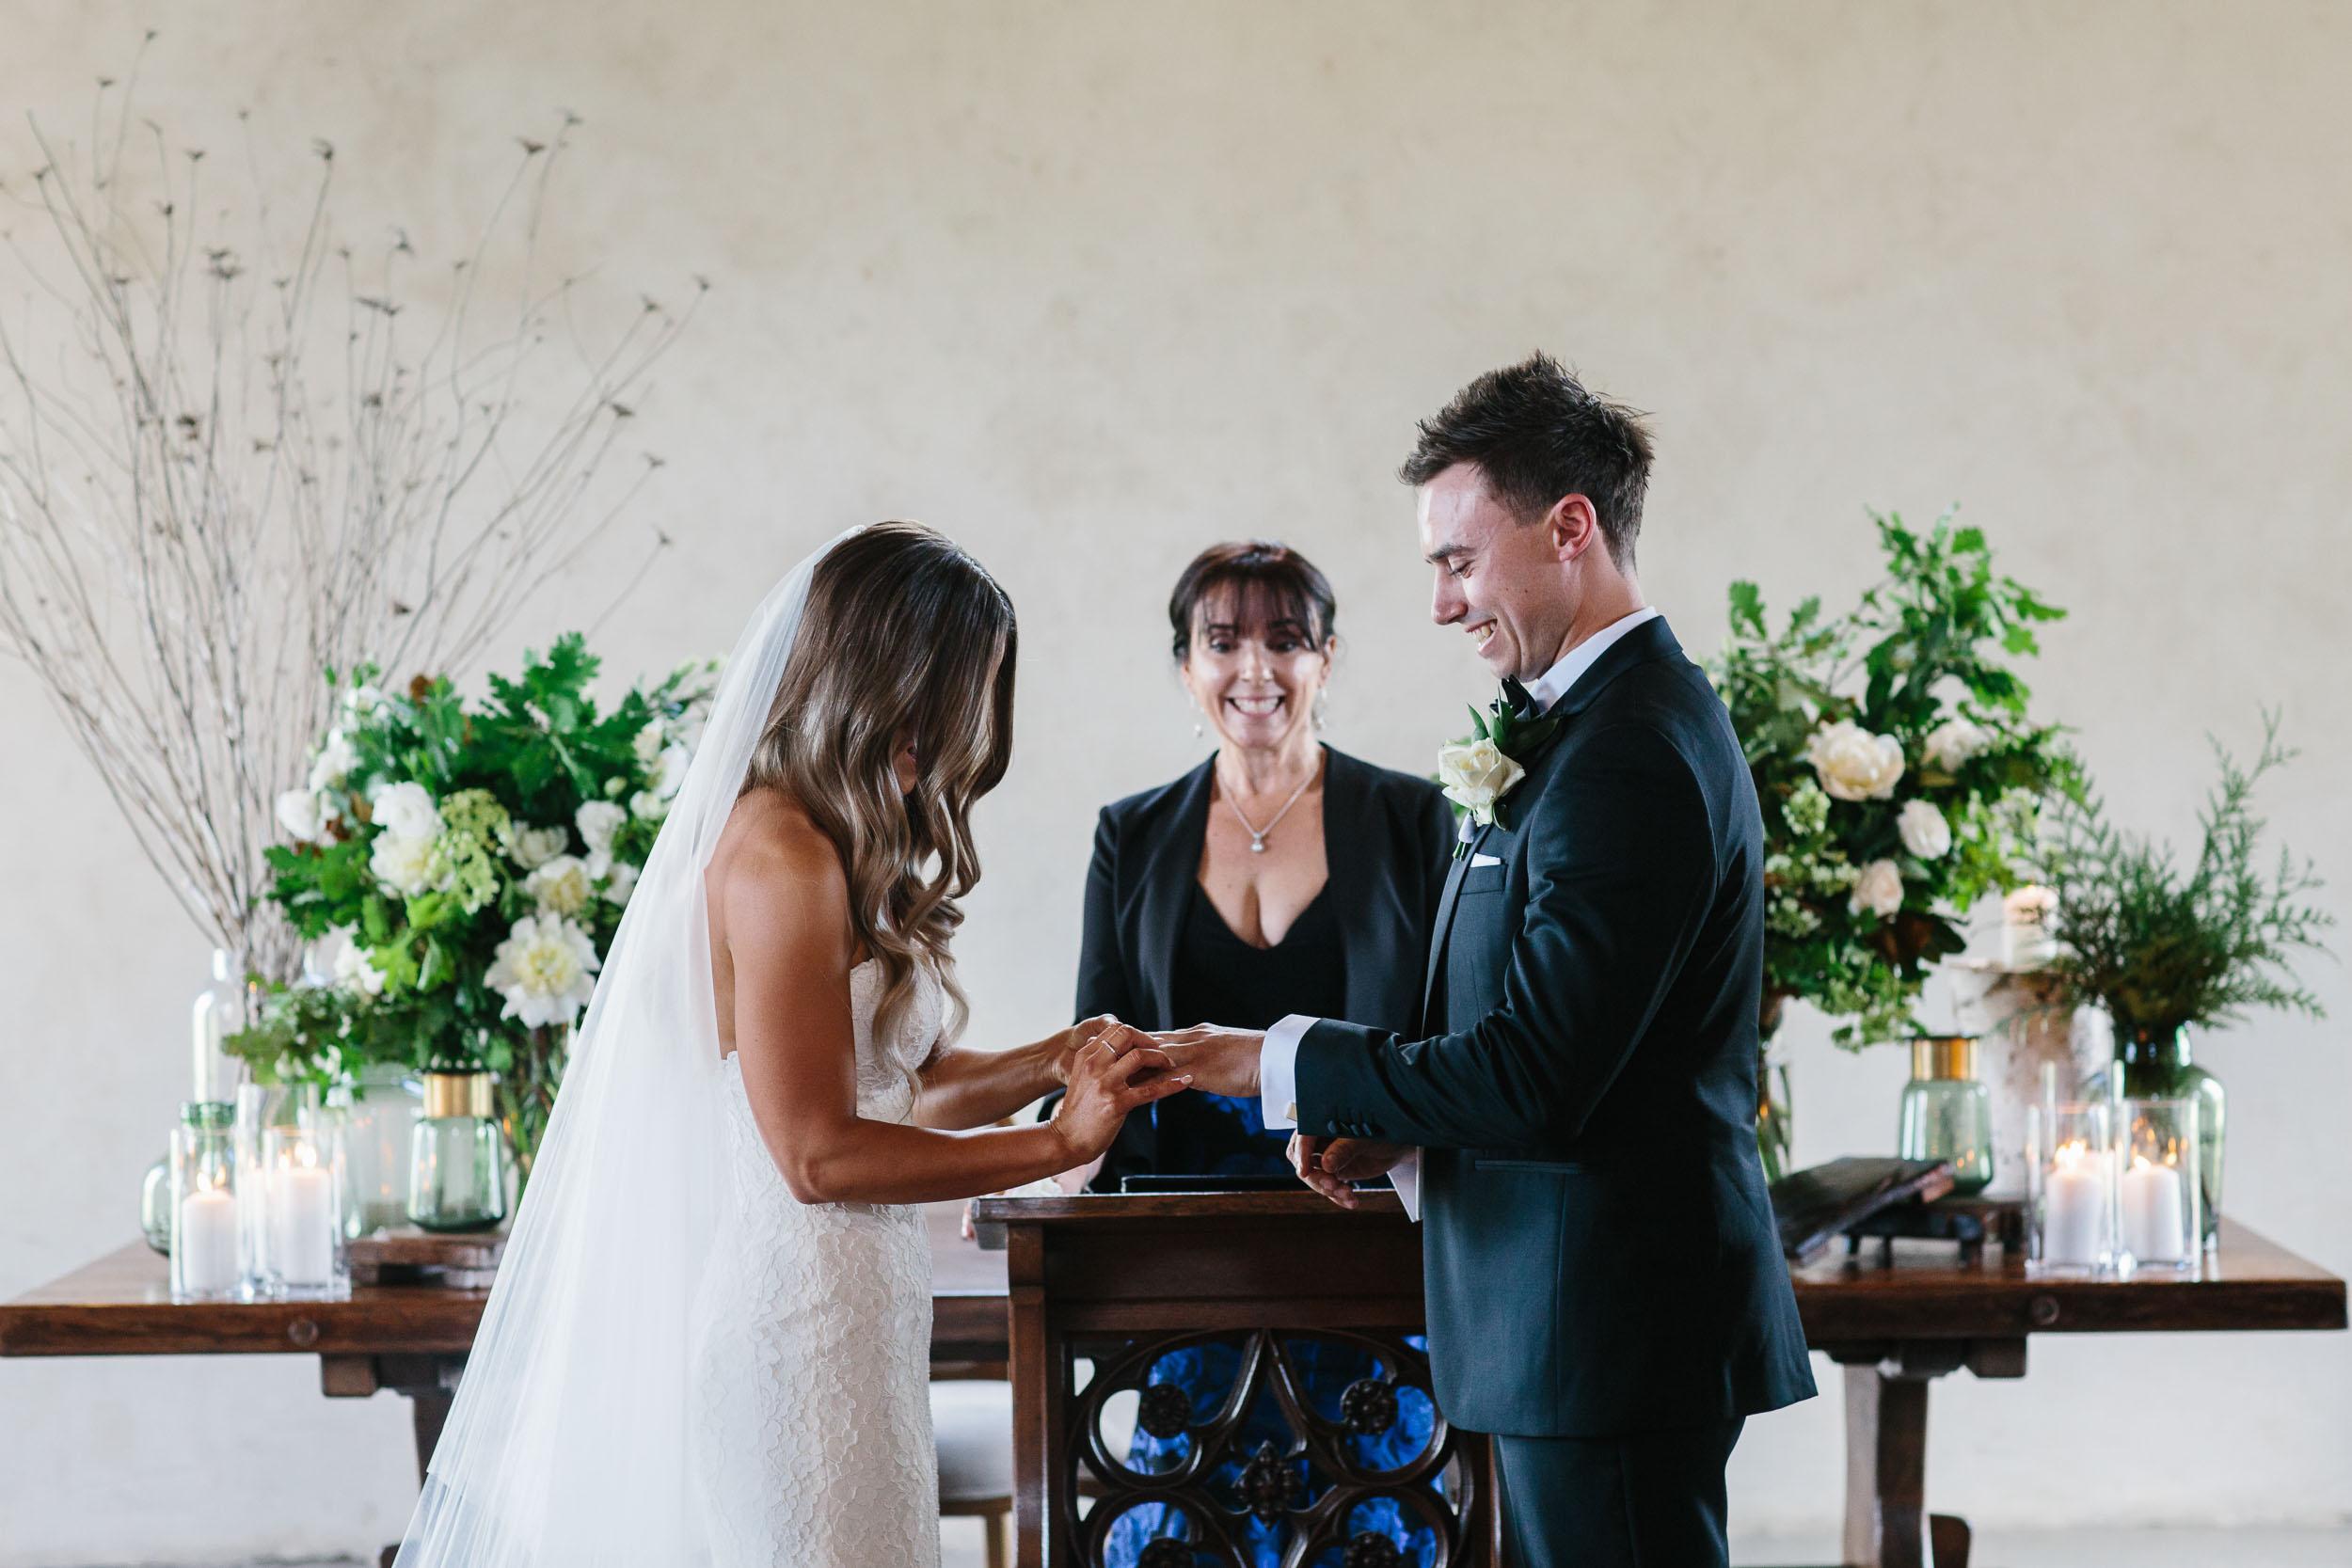 Kas-Richards-Stones-of-the-Yarra-Valley-Wedding-387.jpg